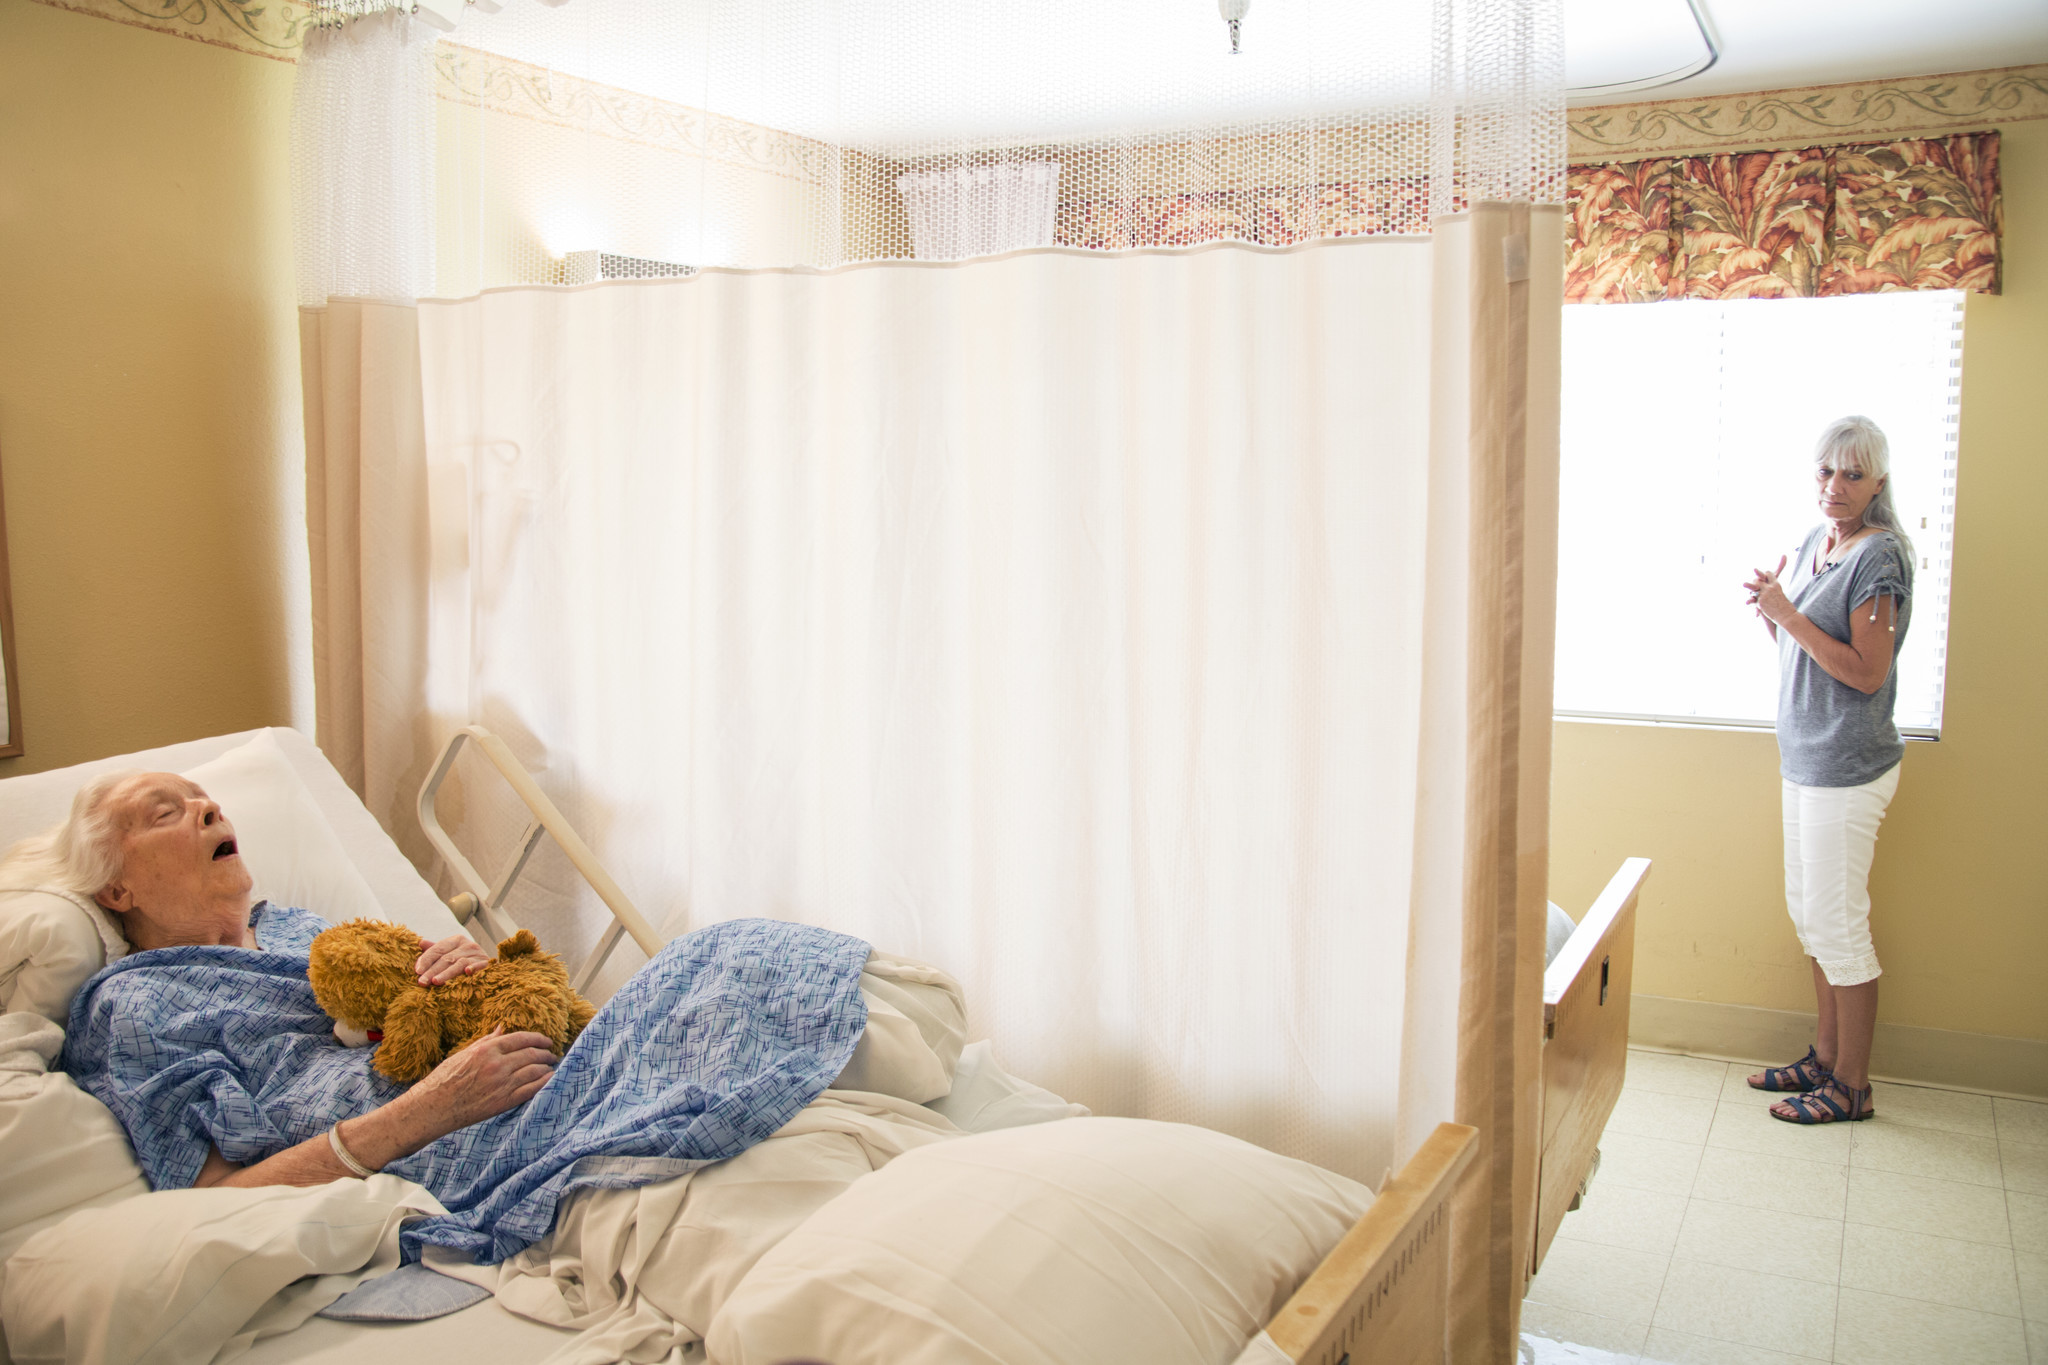 New report details misuse of antipsychotics in nursing homes ...